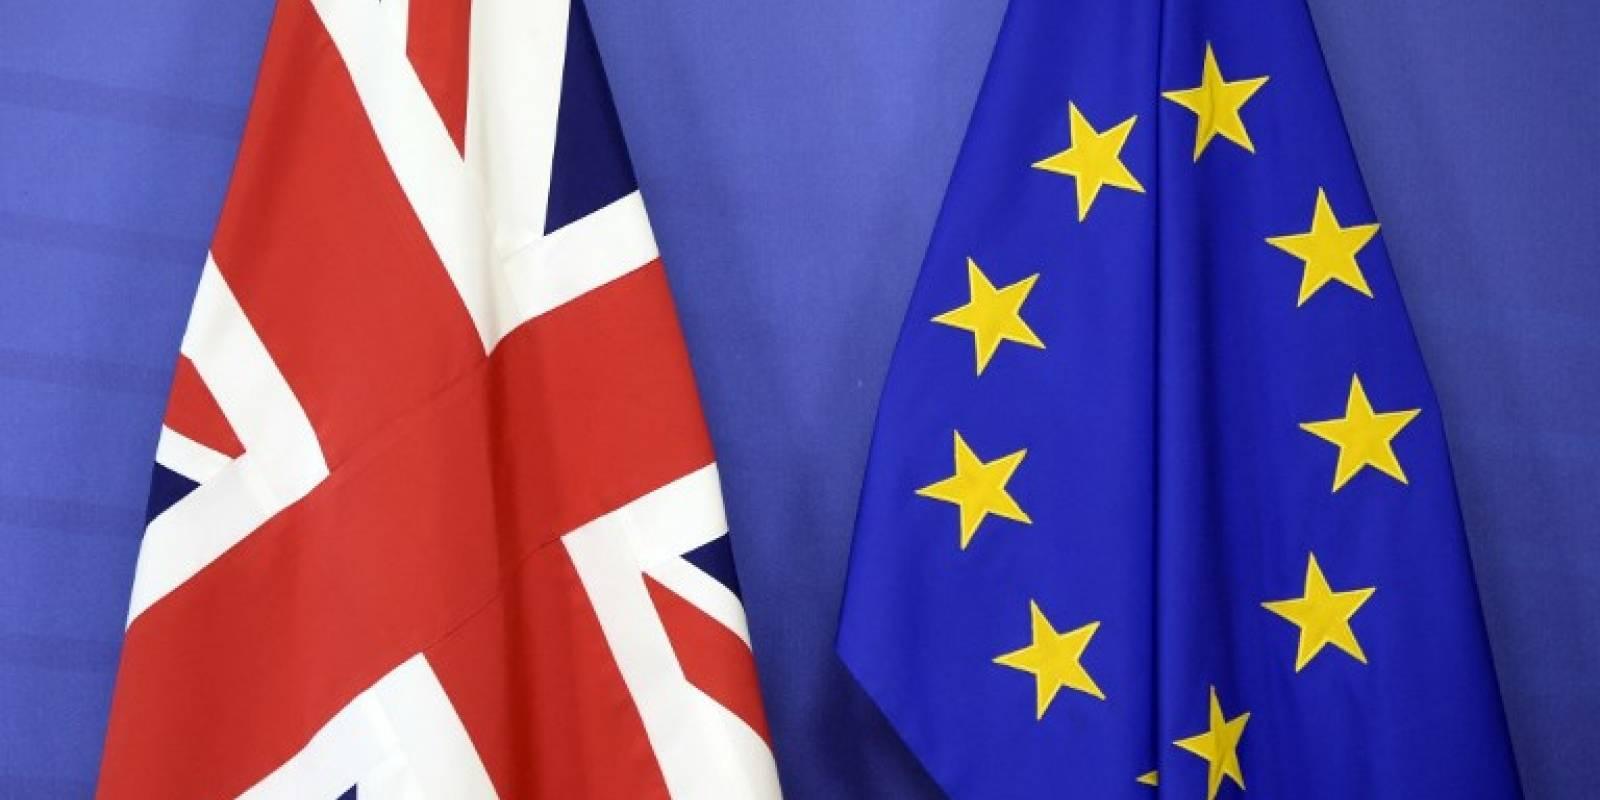 Negociaciones sobre el Brexit